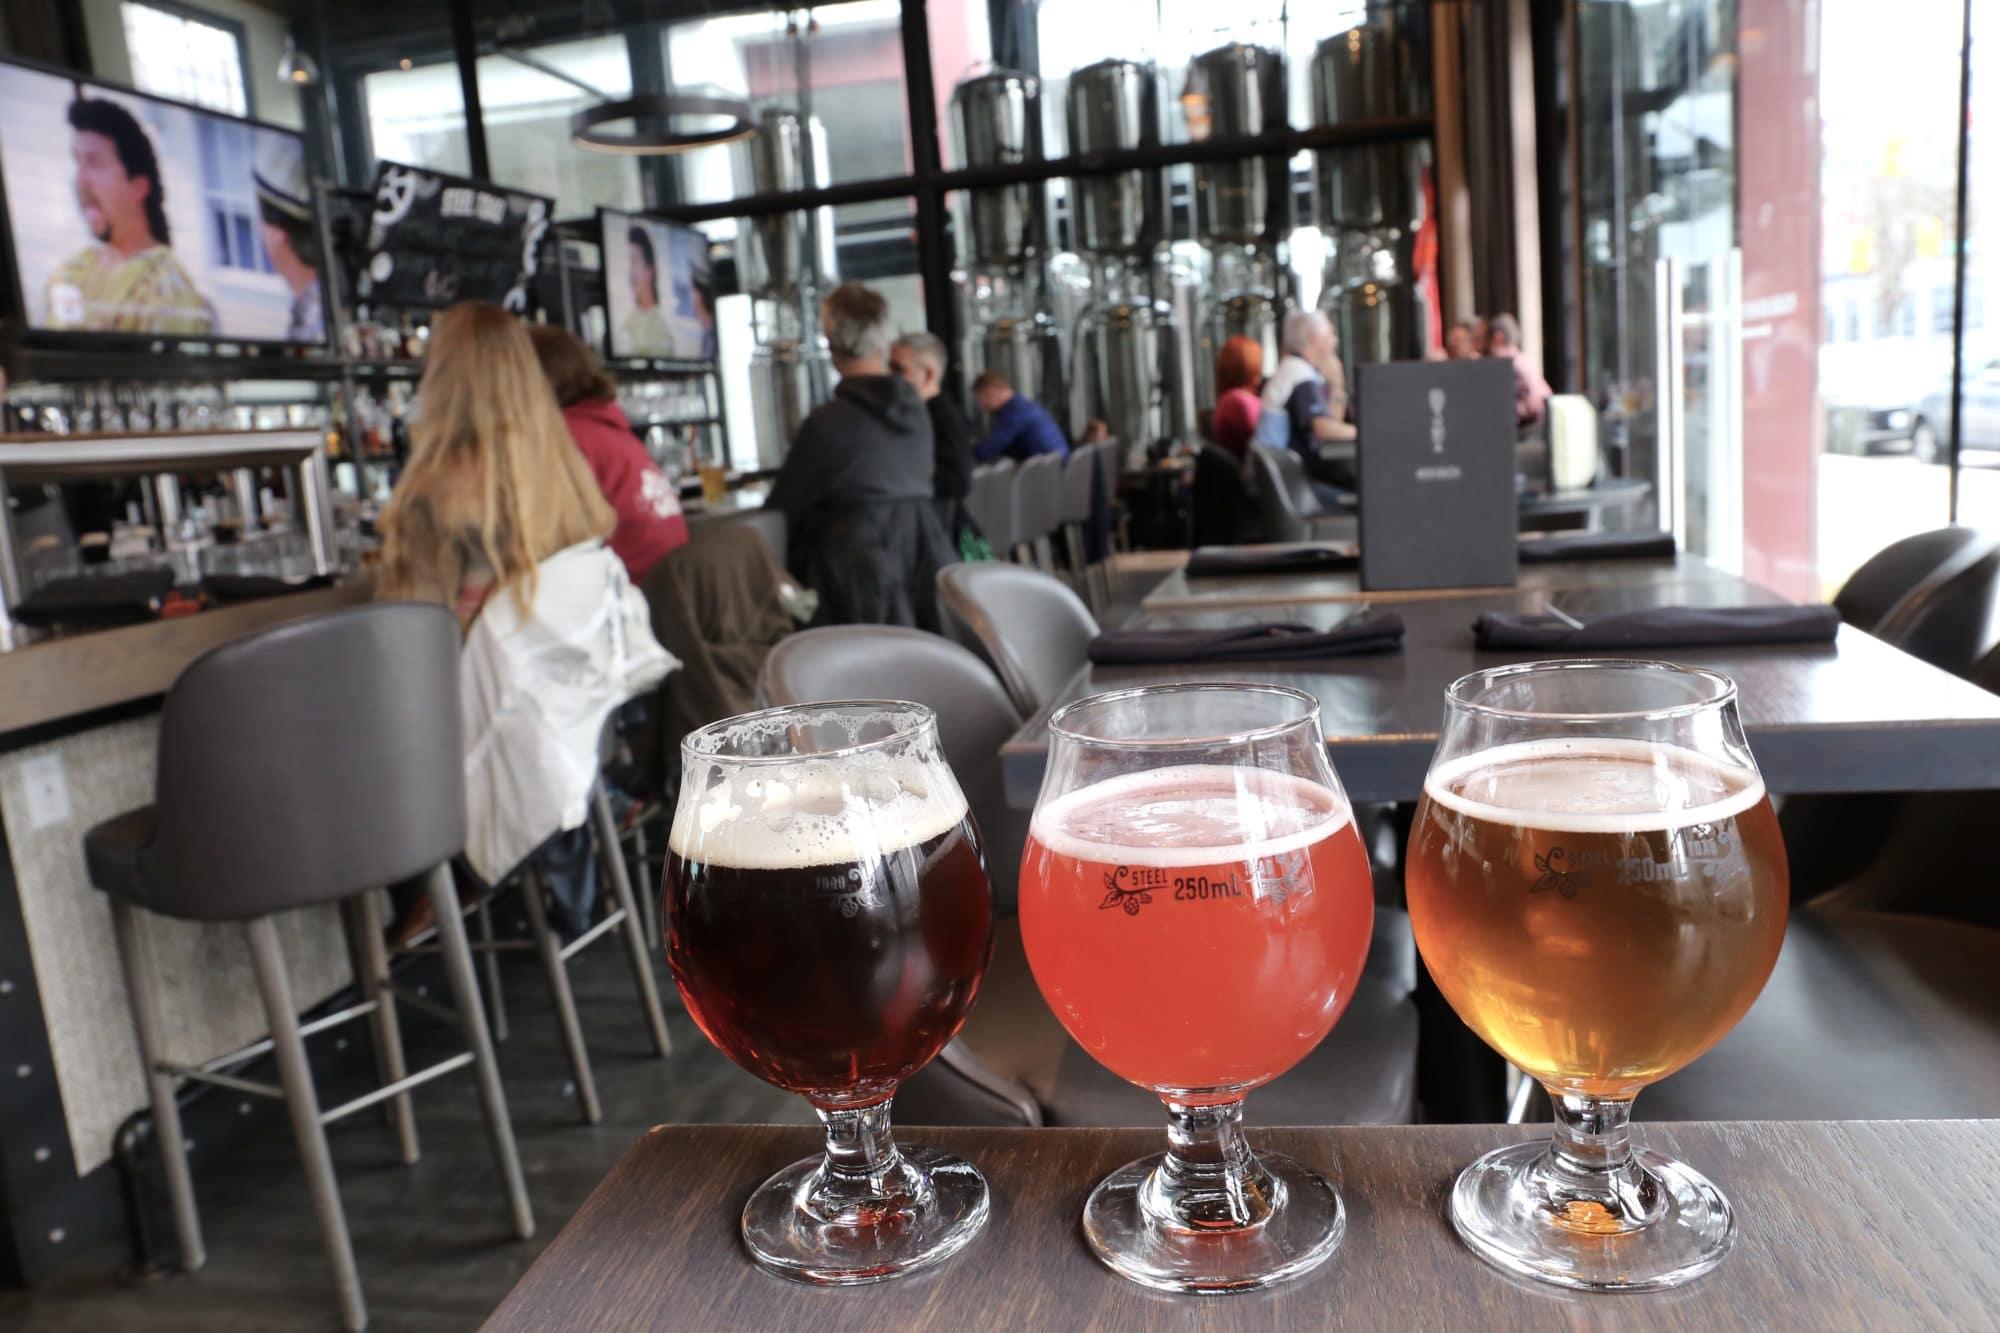 Steel Toad Brewery serves craft beer in a spacious dining room.